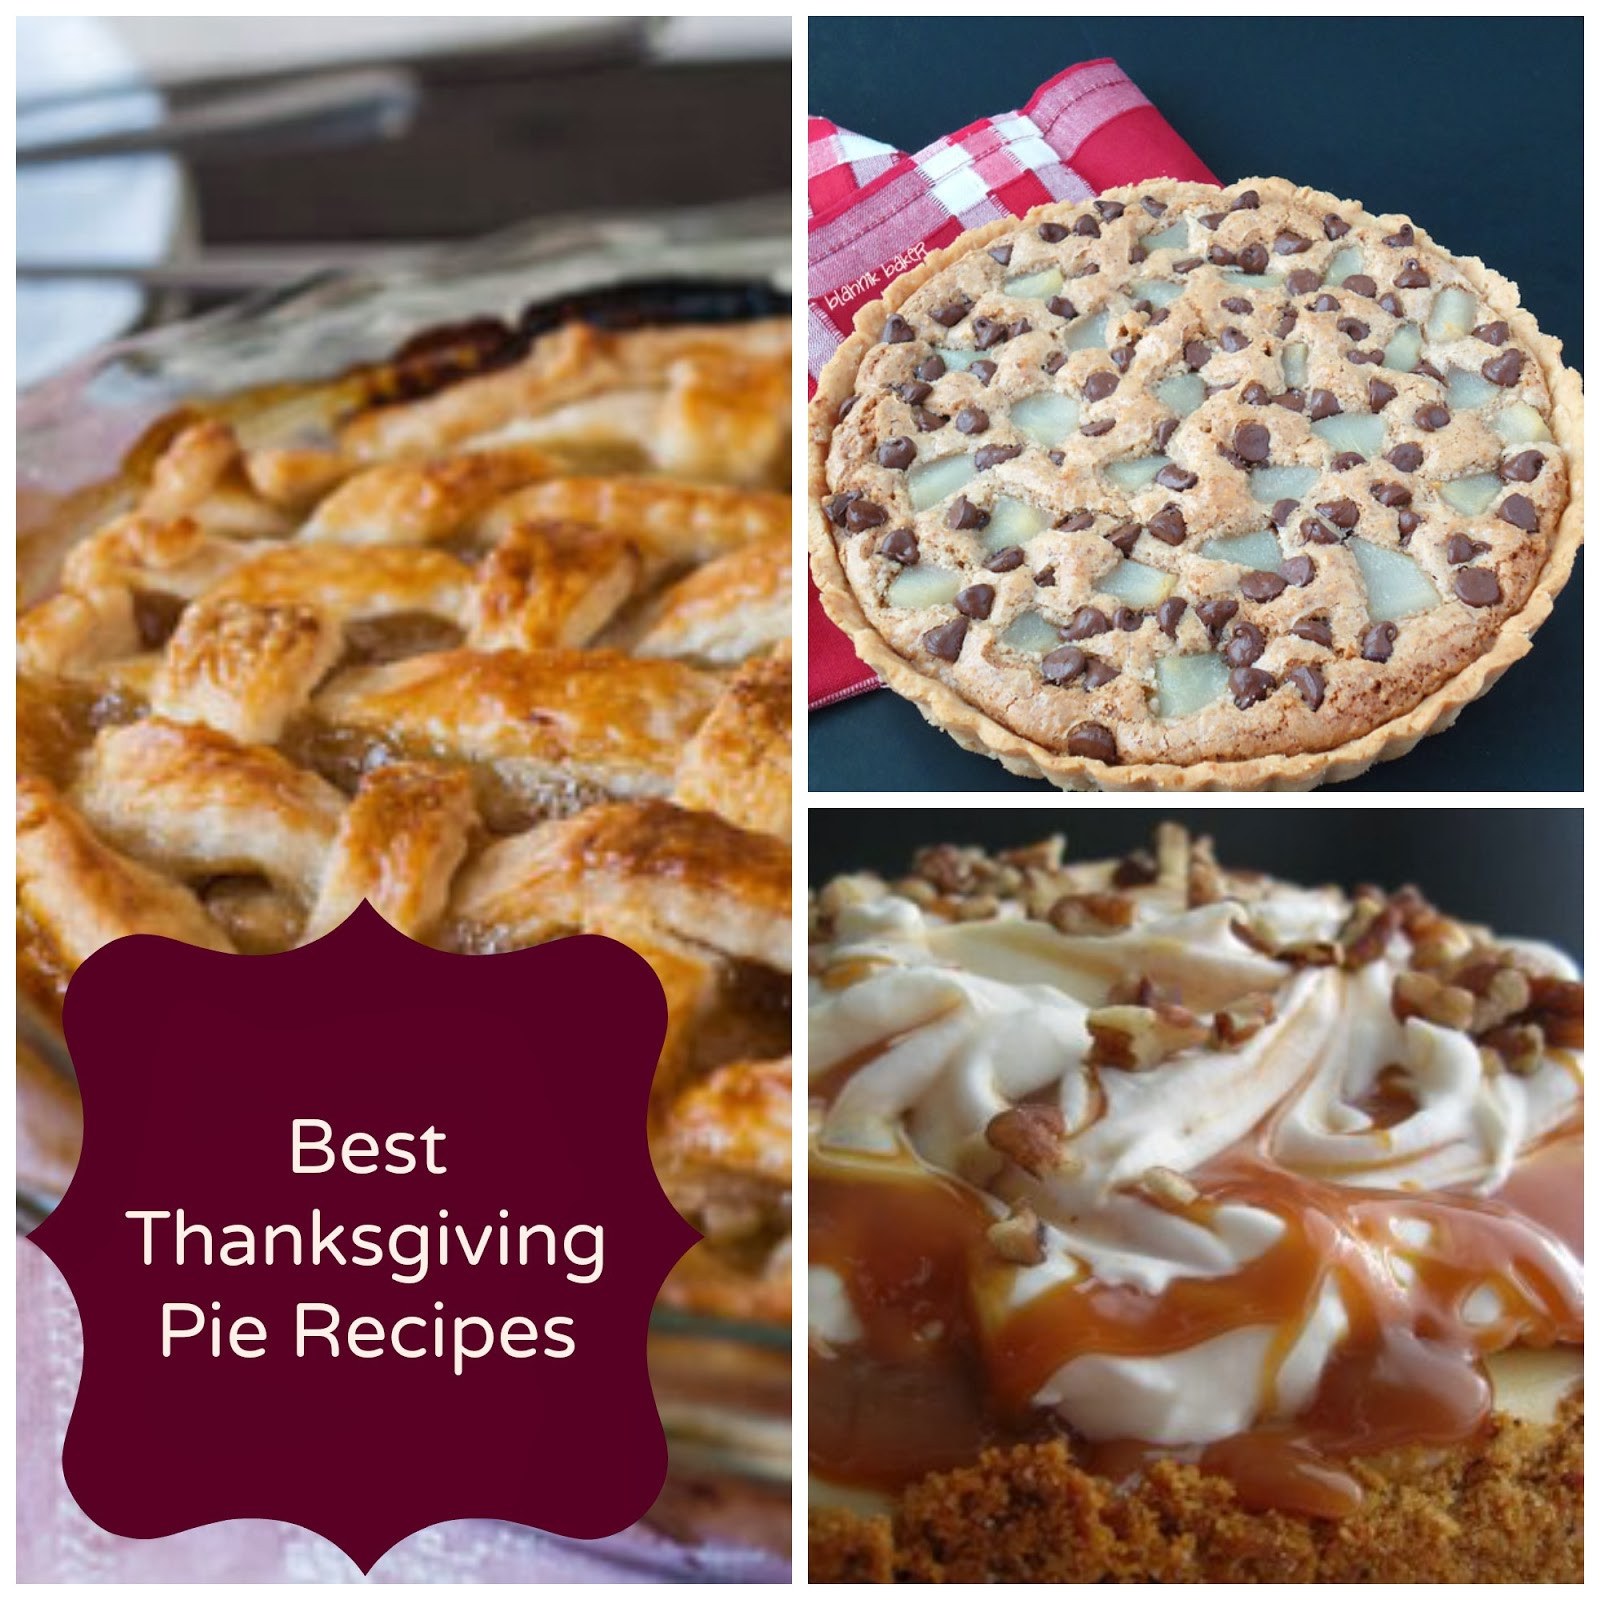 Best Thanksgiving Pie Recipes  Decorating Pennies Best Thanksgiving Pie Recipes